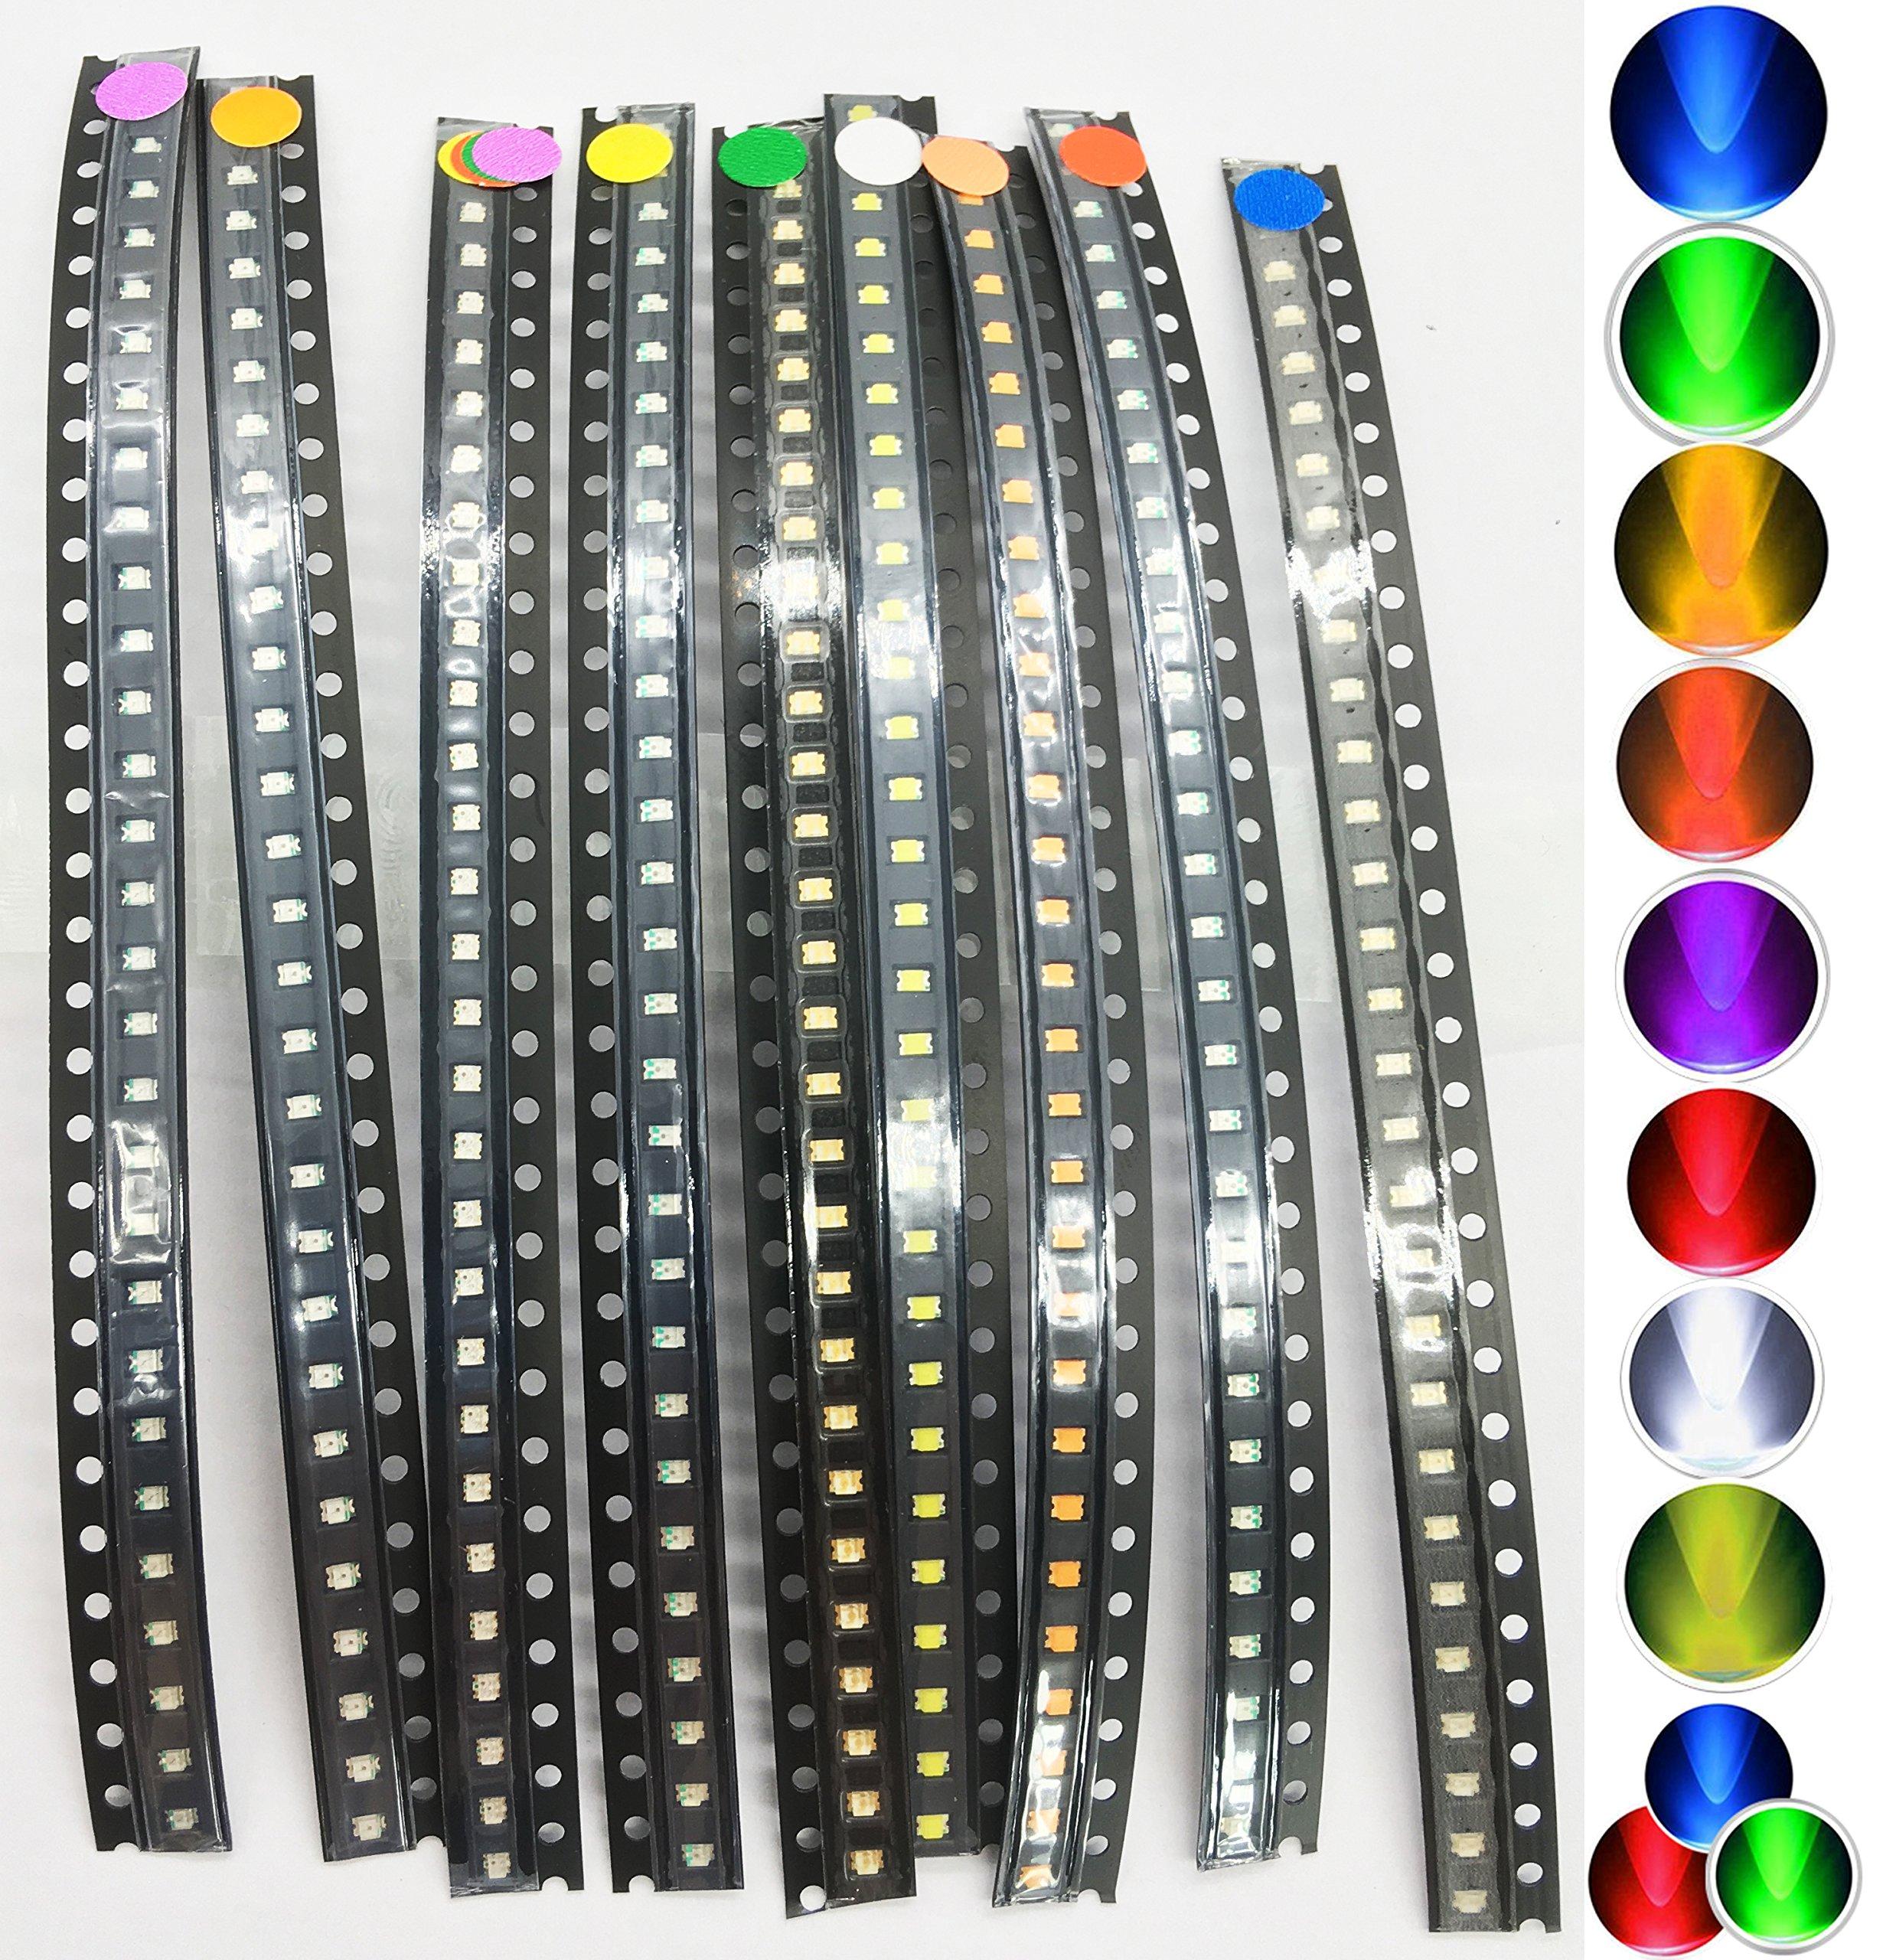 270 pcs SMD SMT 0805 Super Bright LED Blue, Red, White, Green, Orange, Yellow, Purple, Pink, Colorful-flash 30pcs each color, Kaifa (0805)